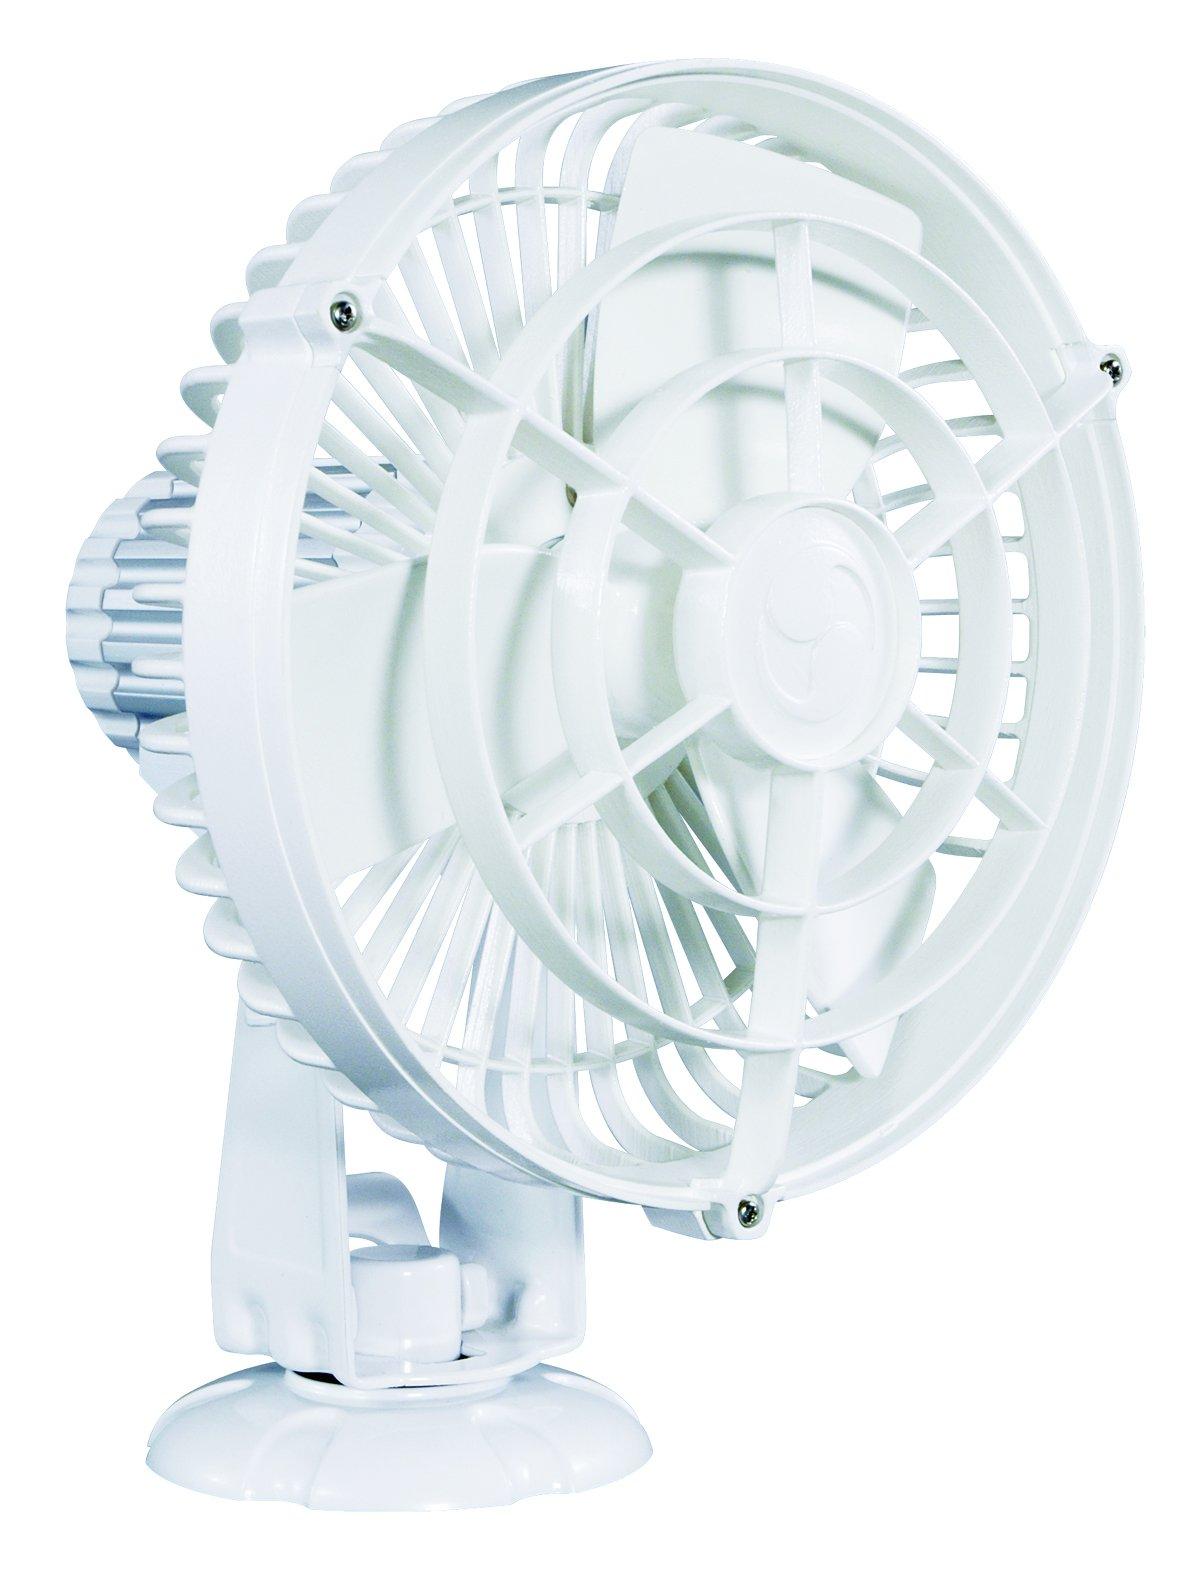 Caframo Kona 12V Weatherproof Variable Speed Fan, White, Small